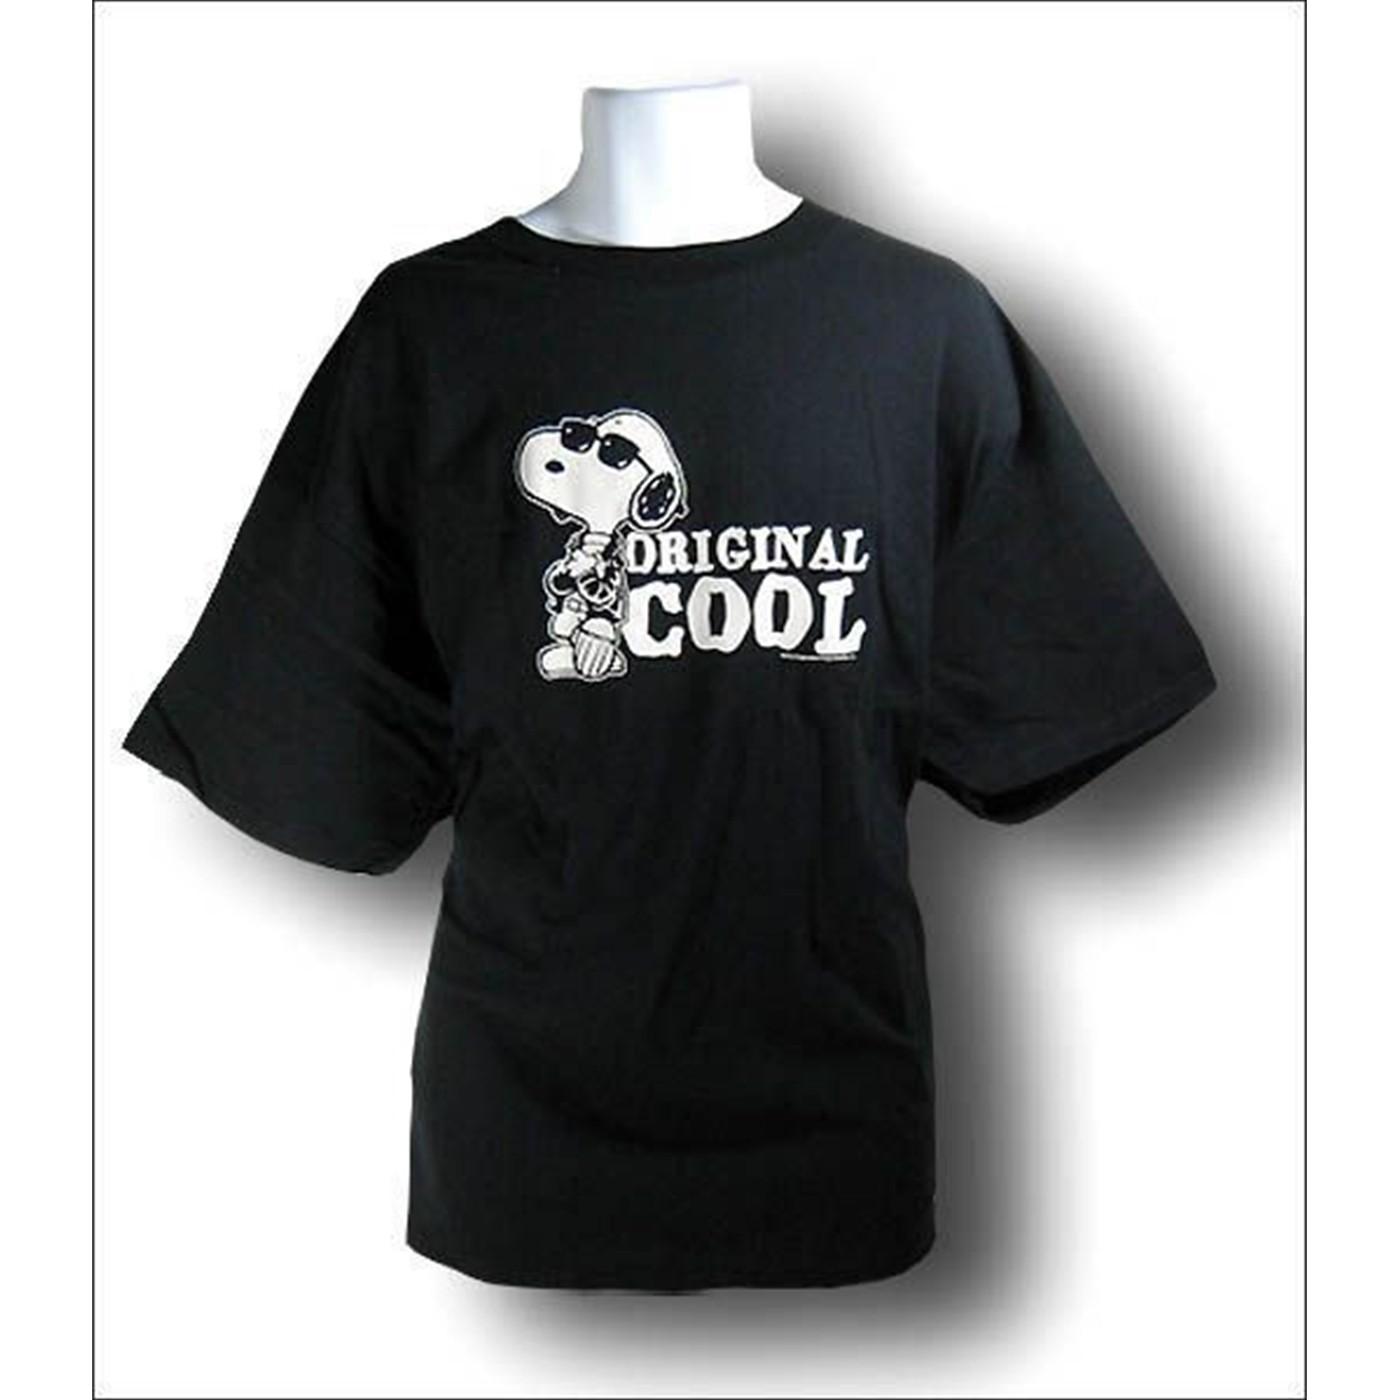 Snoopy T-Shirt Original Cool